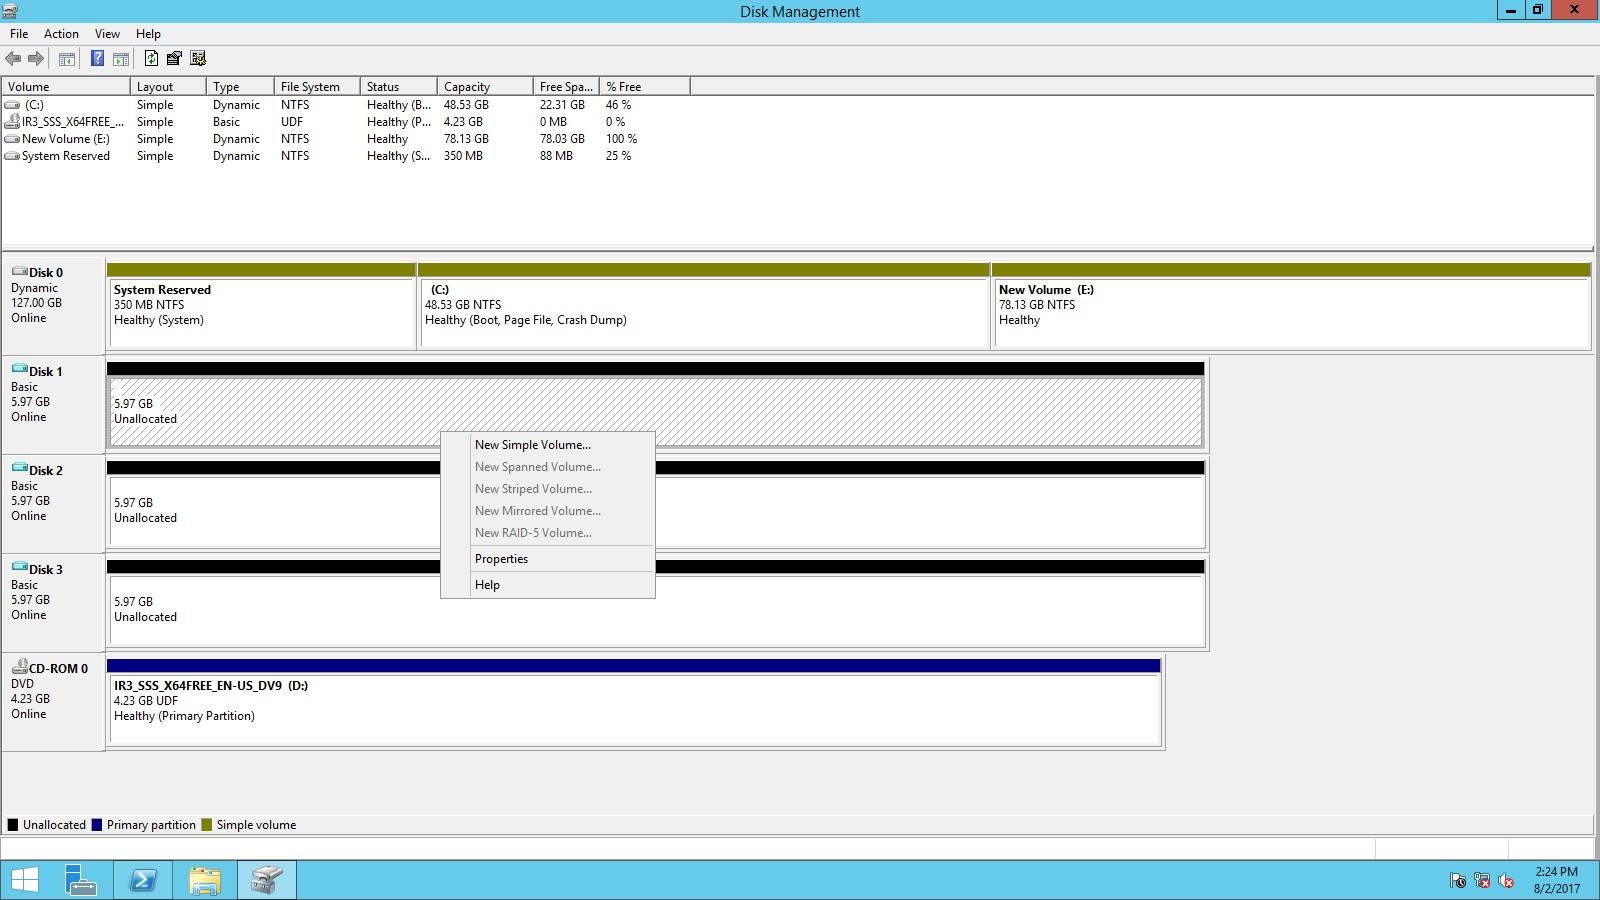 Hyper-v Windows Server 2012 r2 Only simple volume is availble, rest